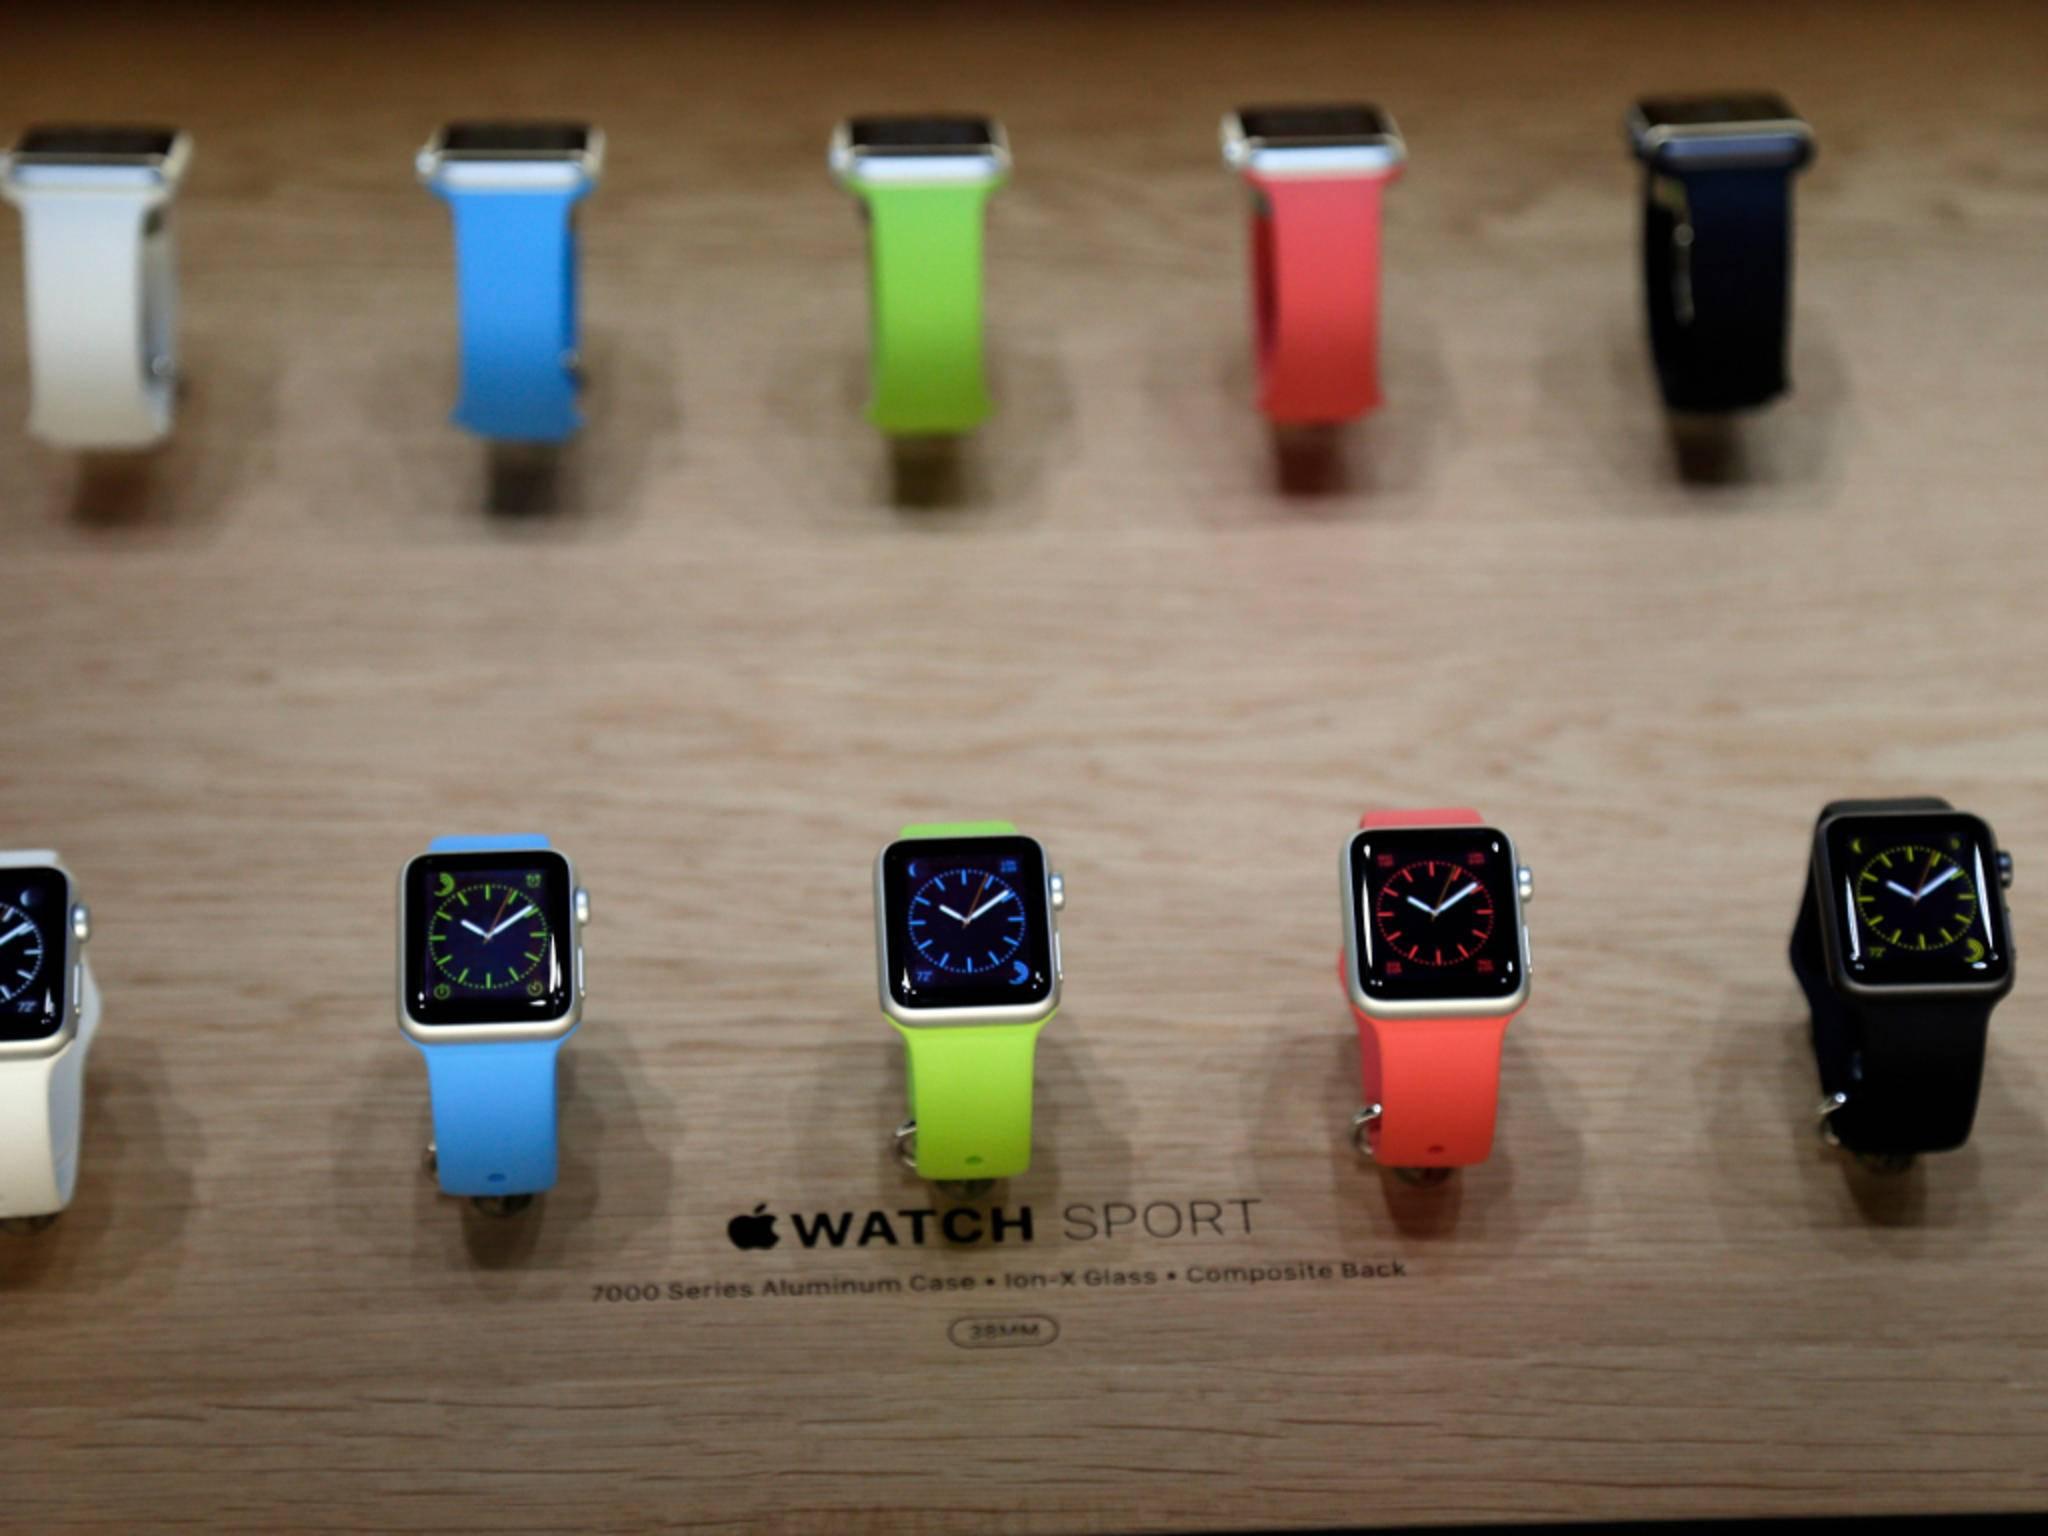 US-Konsumenten sind bei der Apple Watch bislang noch skeptisch.